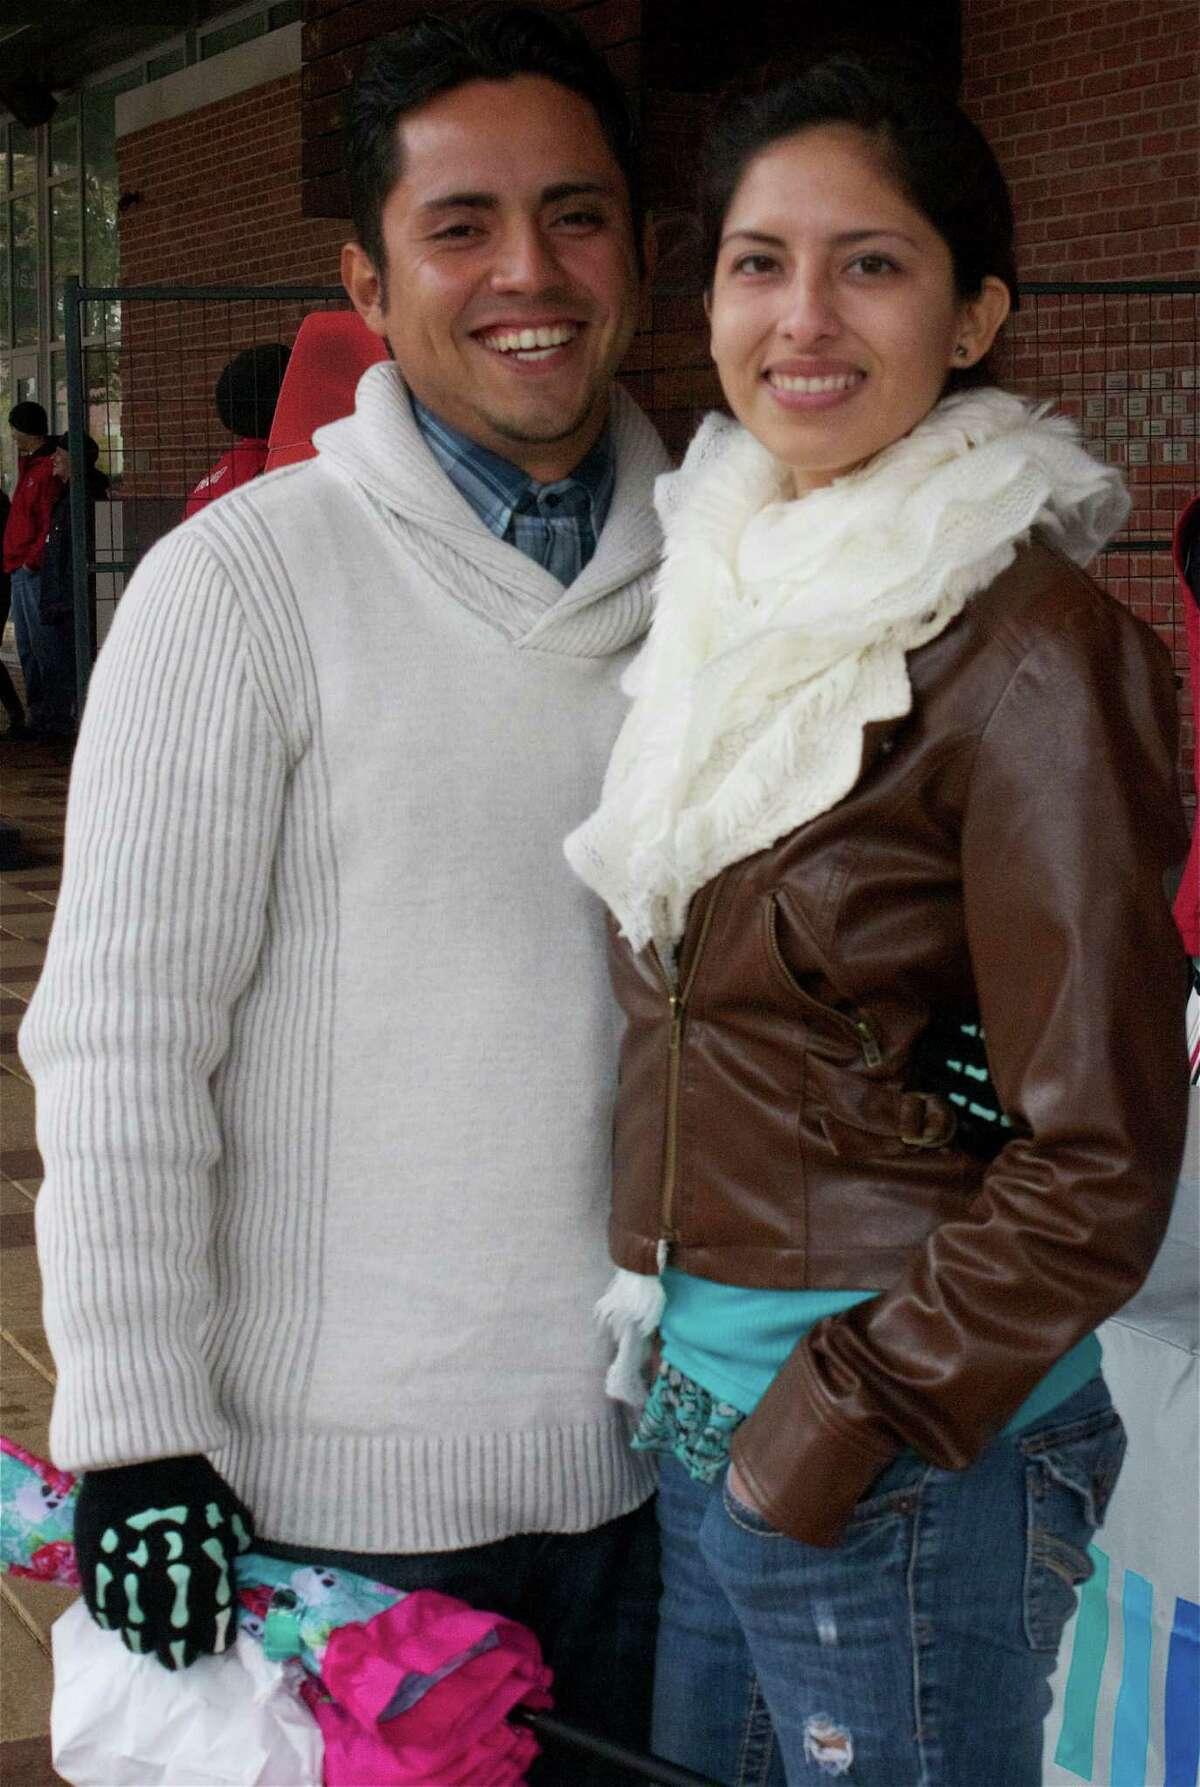 Oscar Hernandez and Carolina Ramirez